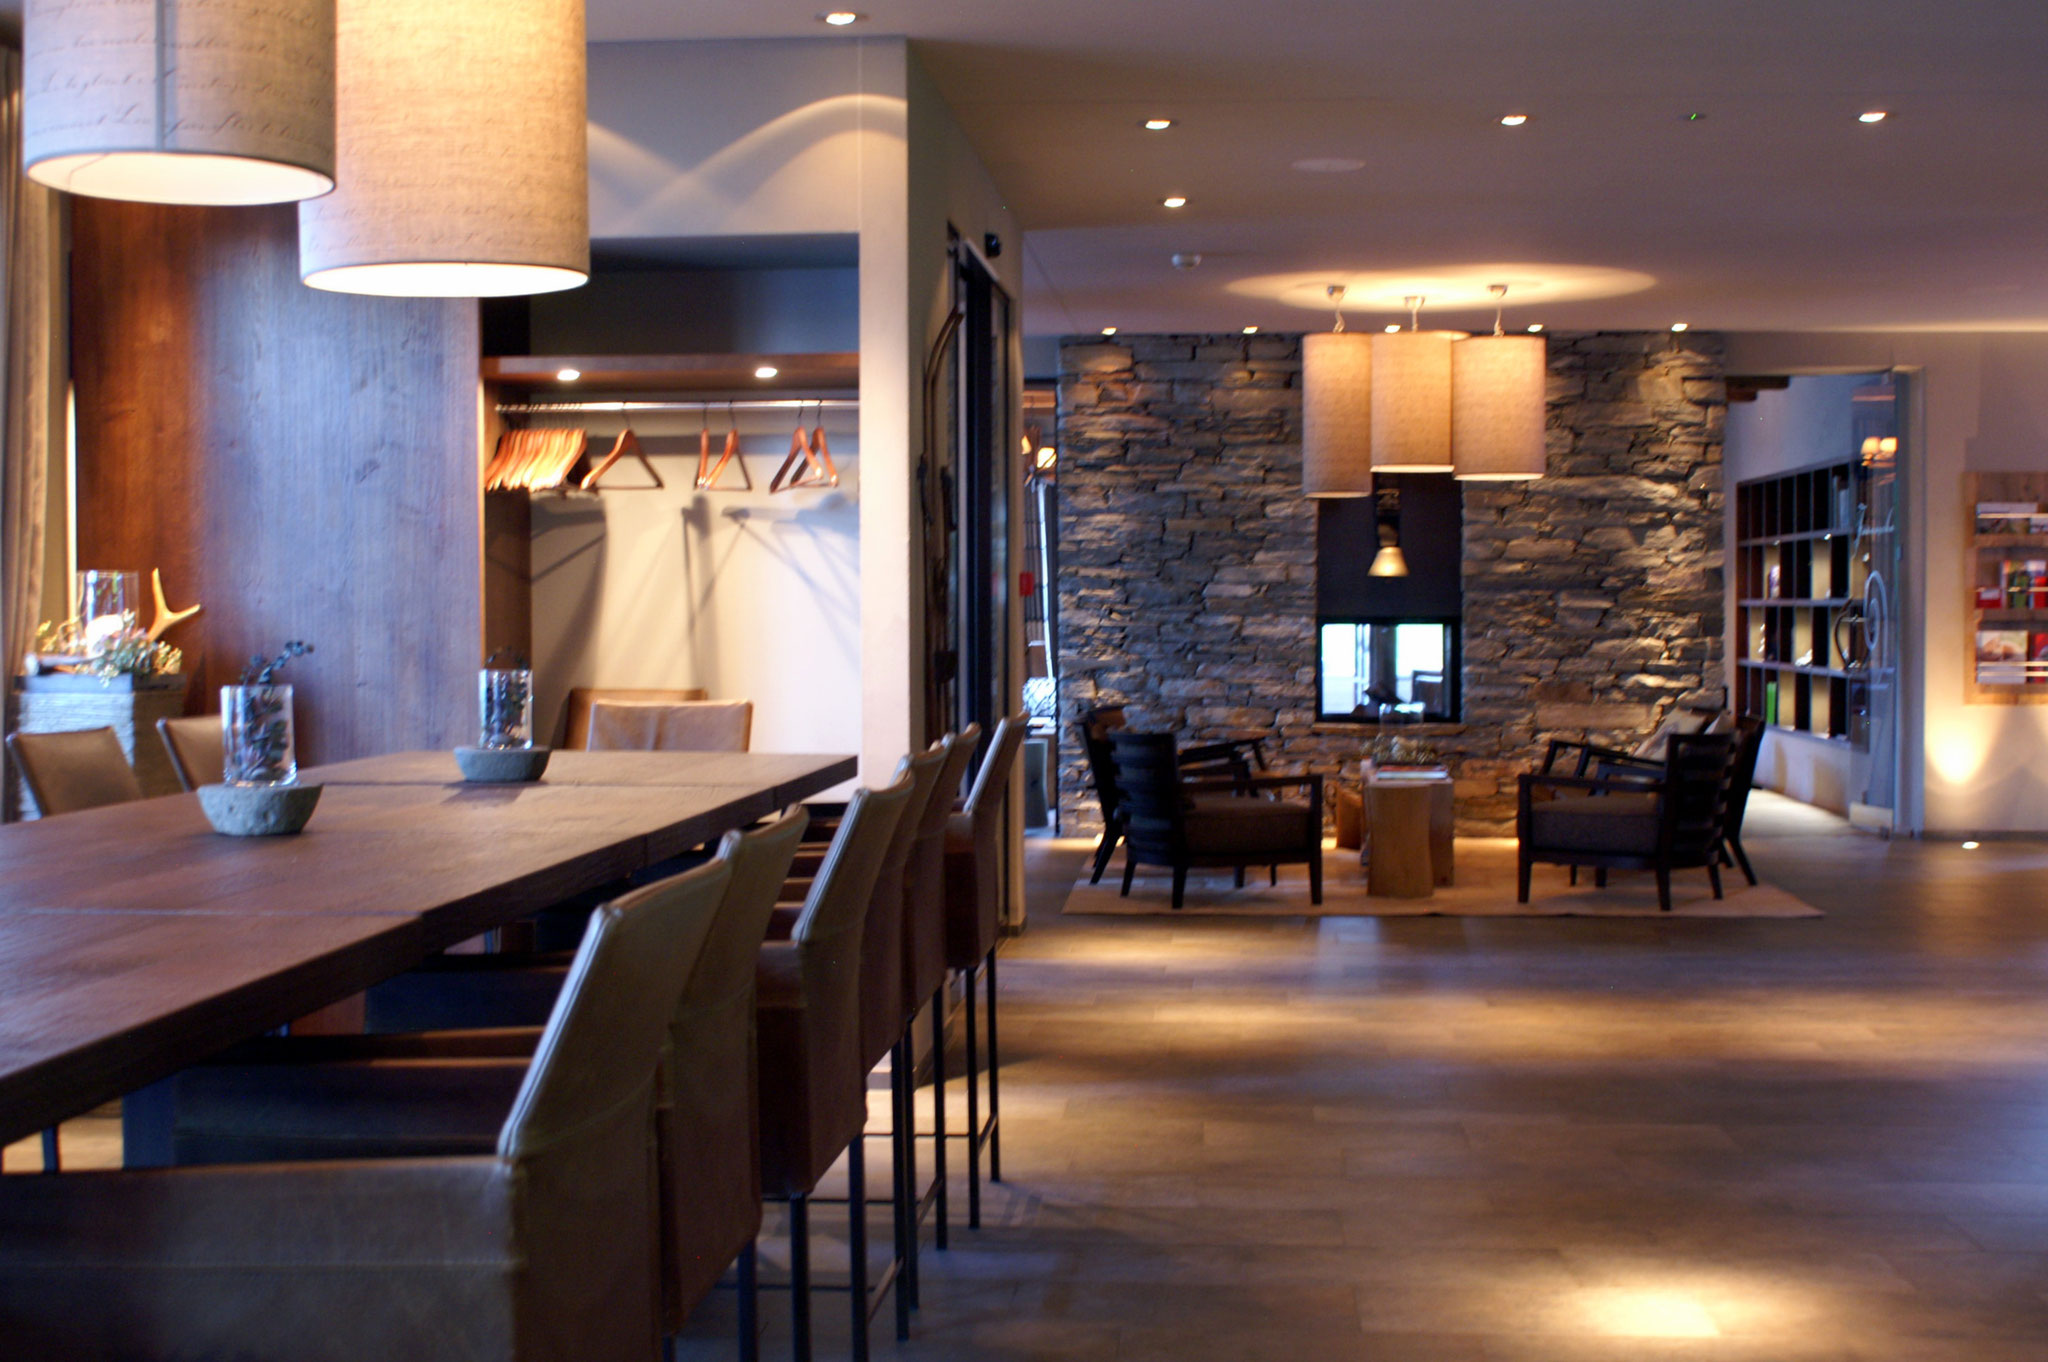 detaillierte bewertung bergspa hotel la val erholsame ferien dank. Black Bedroom Furniture Sets. Home Design Ideas